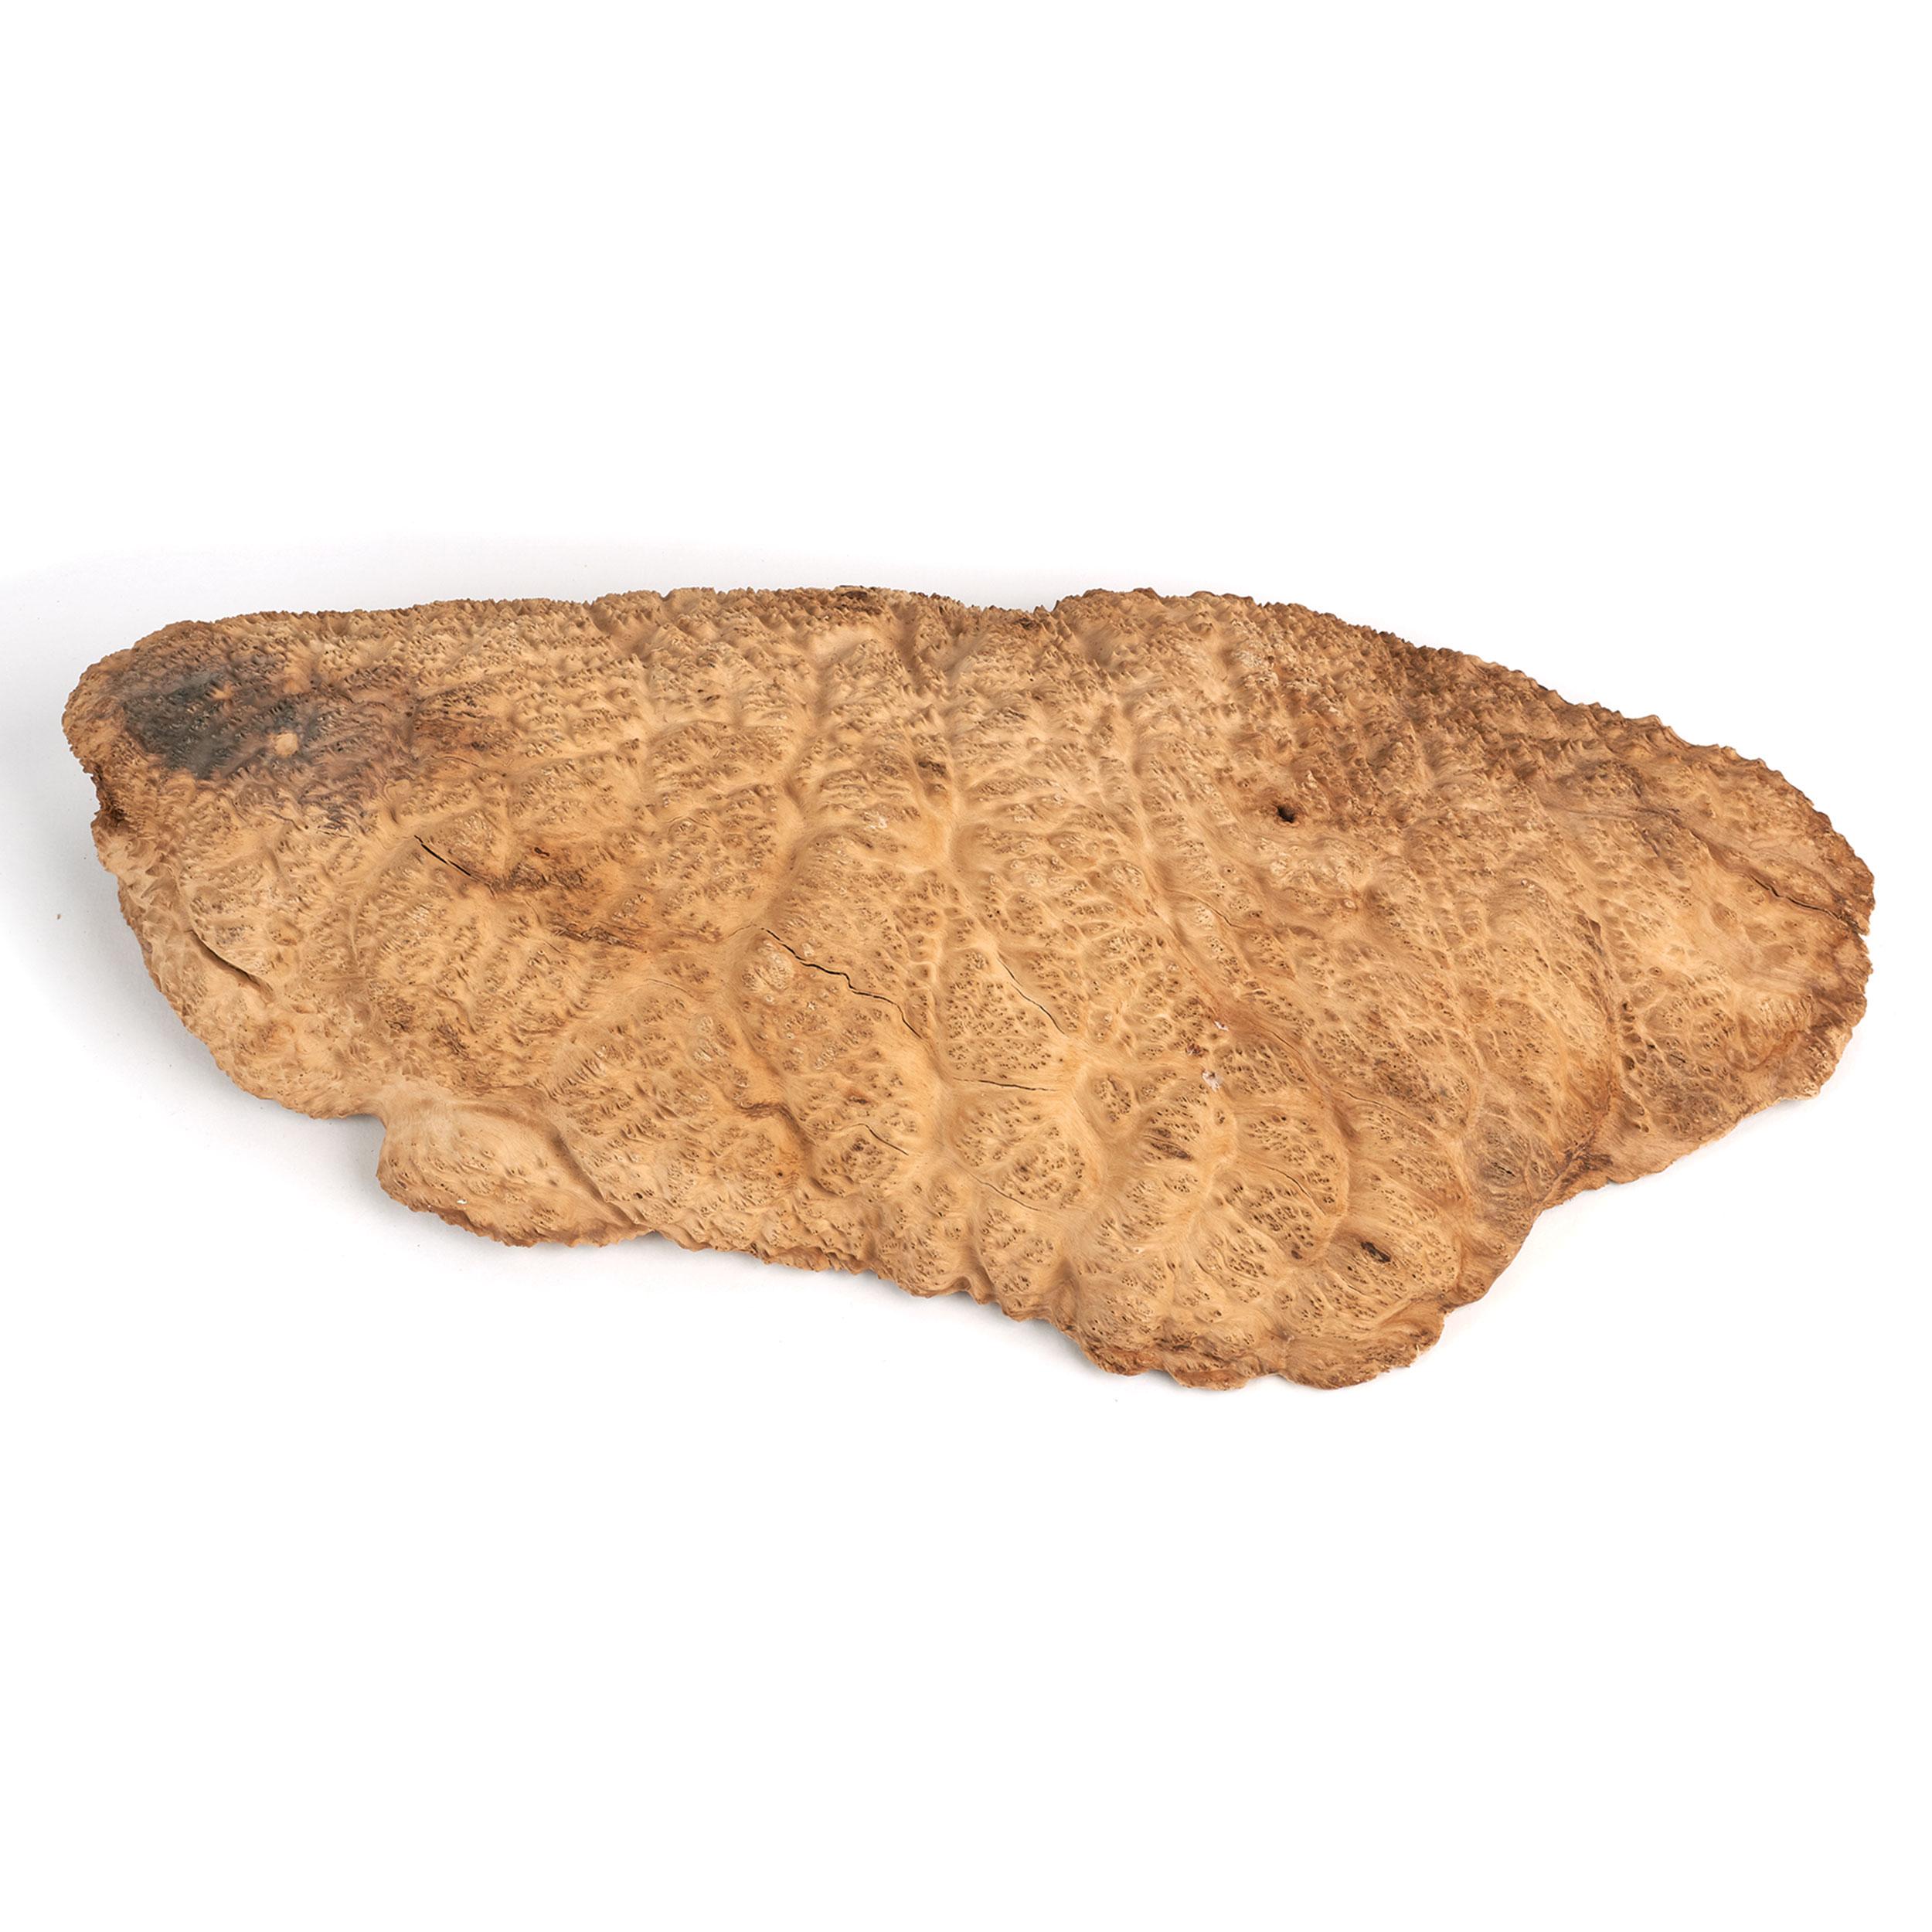 Australian Brown Mallee Burl Cap 2kg-4kg